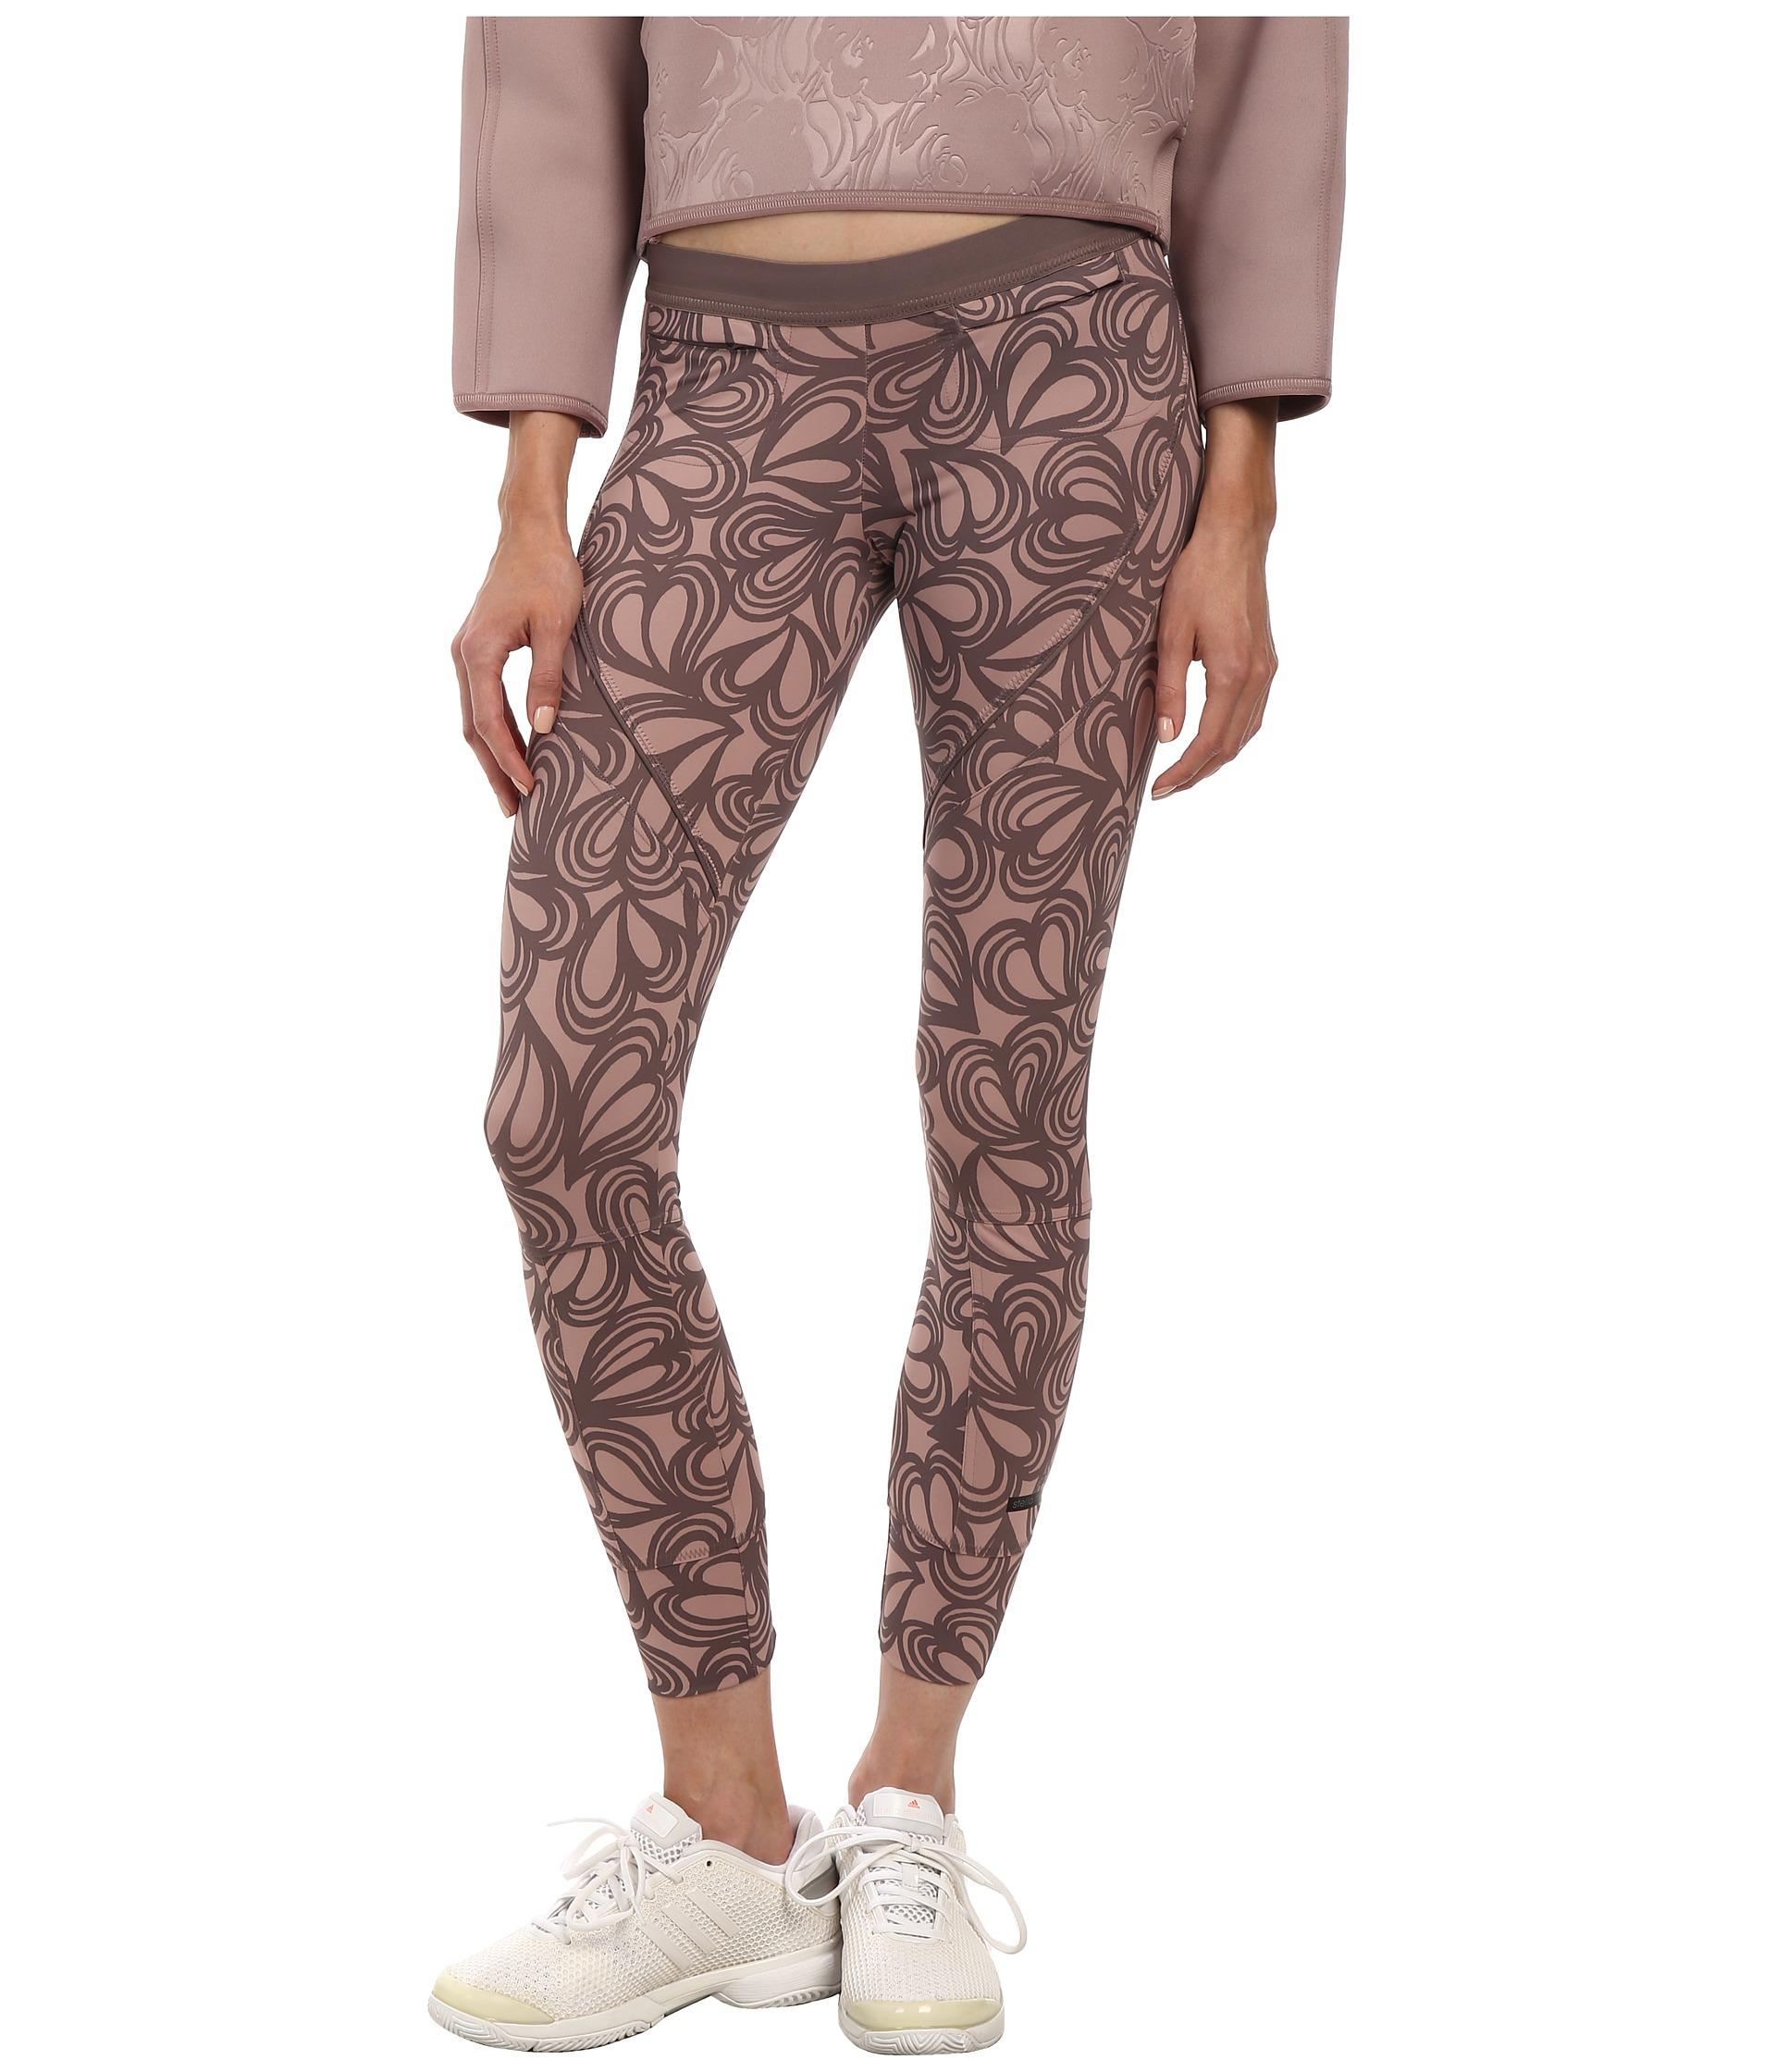 1beb1987e9f63 adidas By Stella McCartney Studio Long Tight Pants S15446 in Pink - Lyst